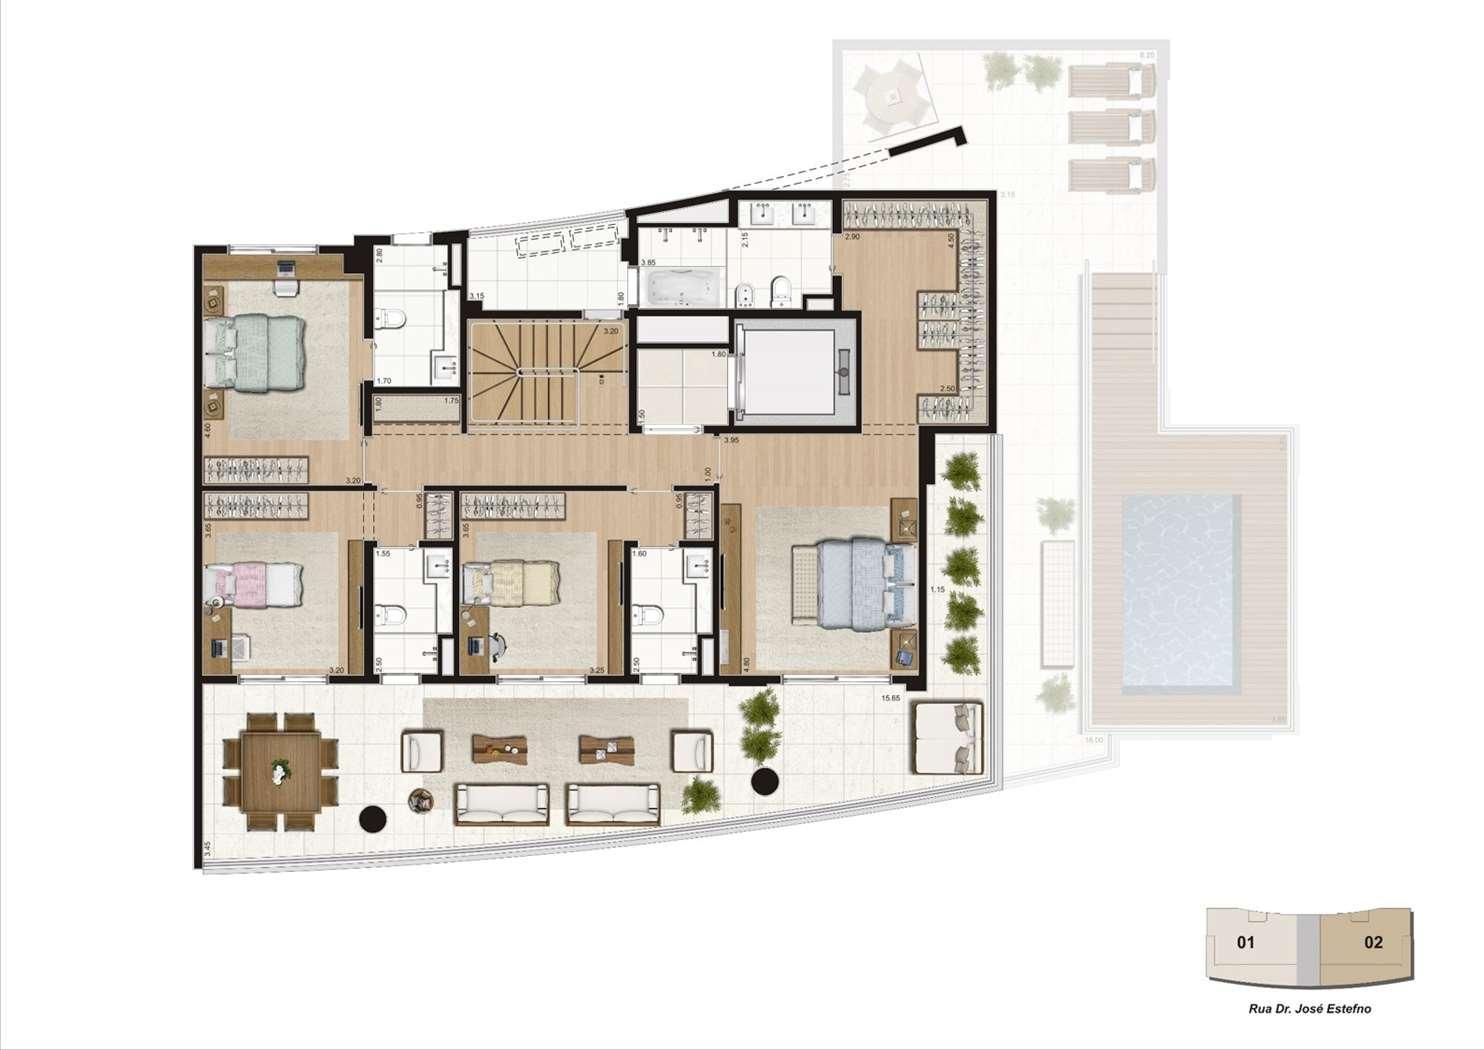 Planta cobertura duplex 460m², 4 suítes  - Pavimento superior